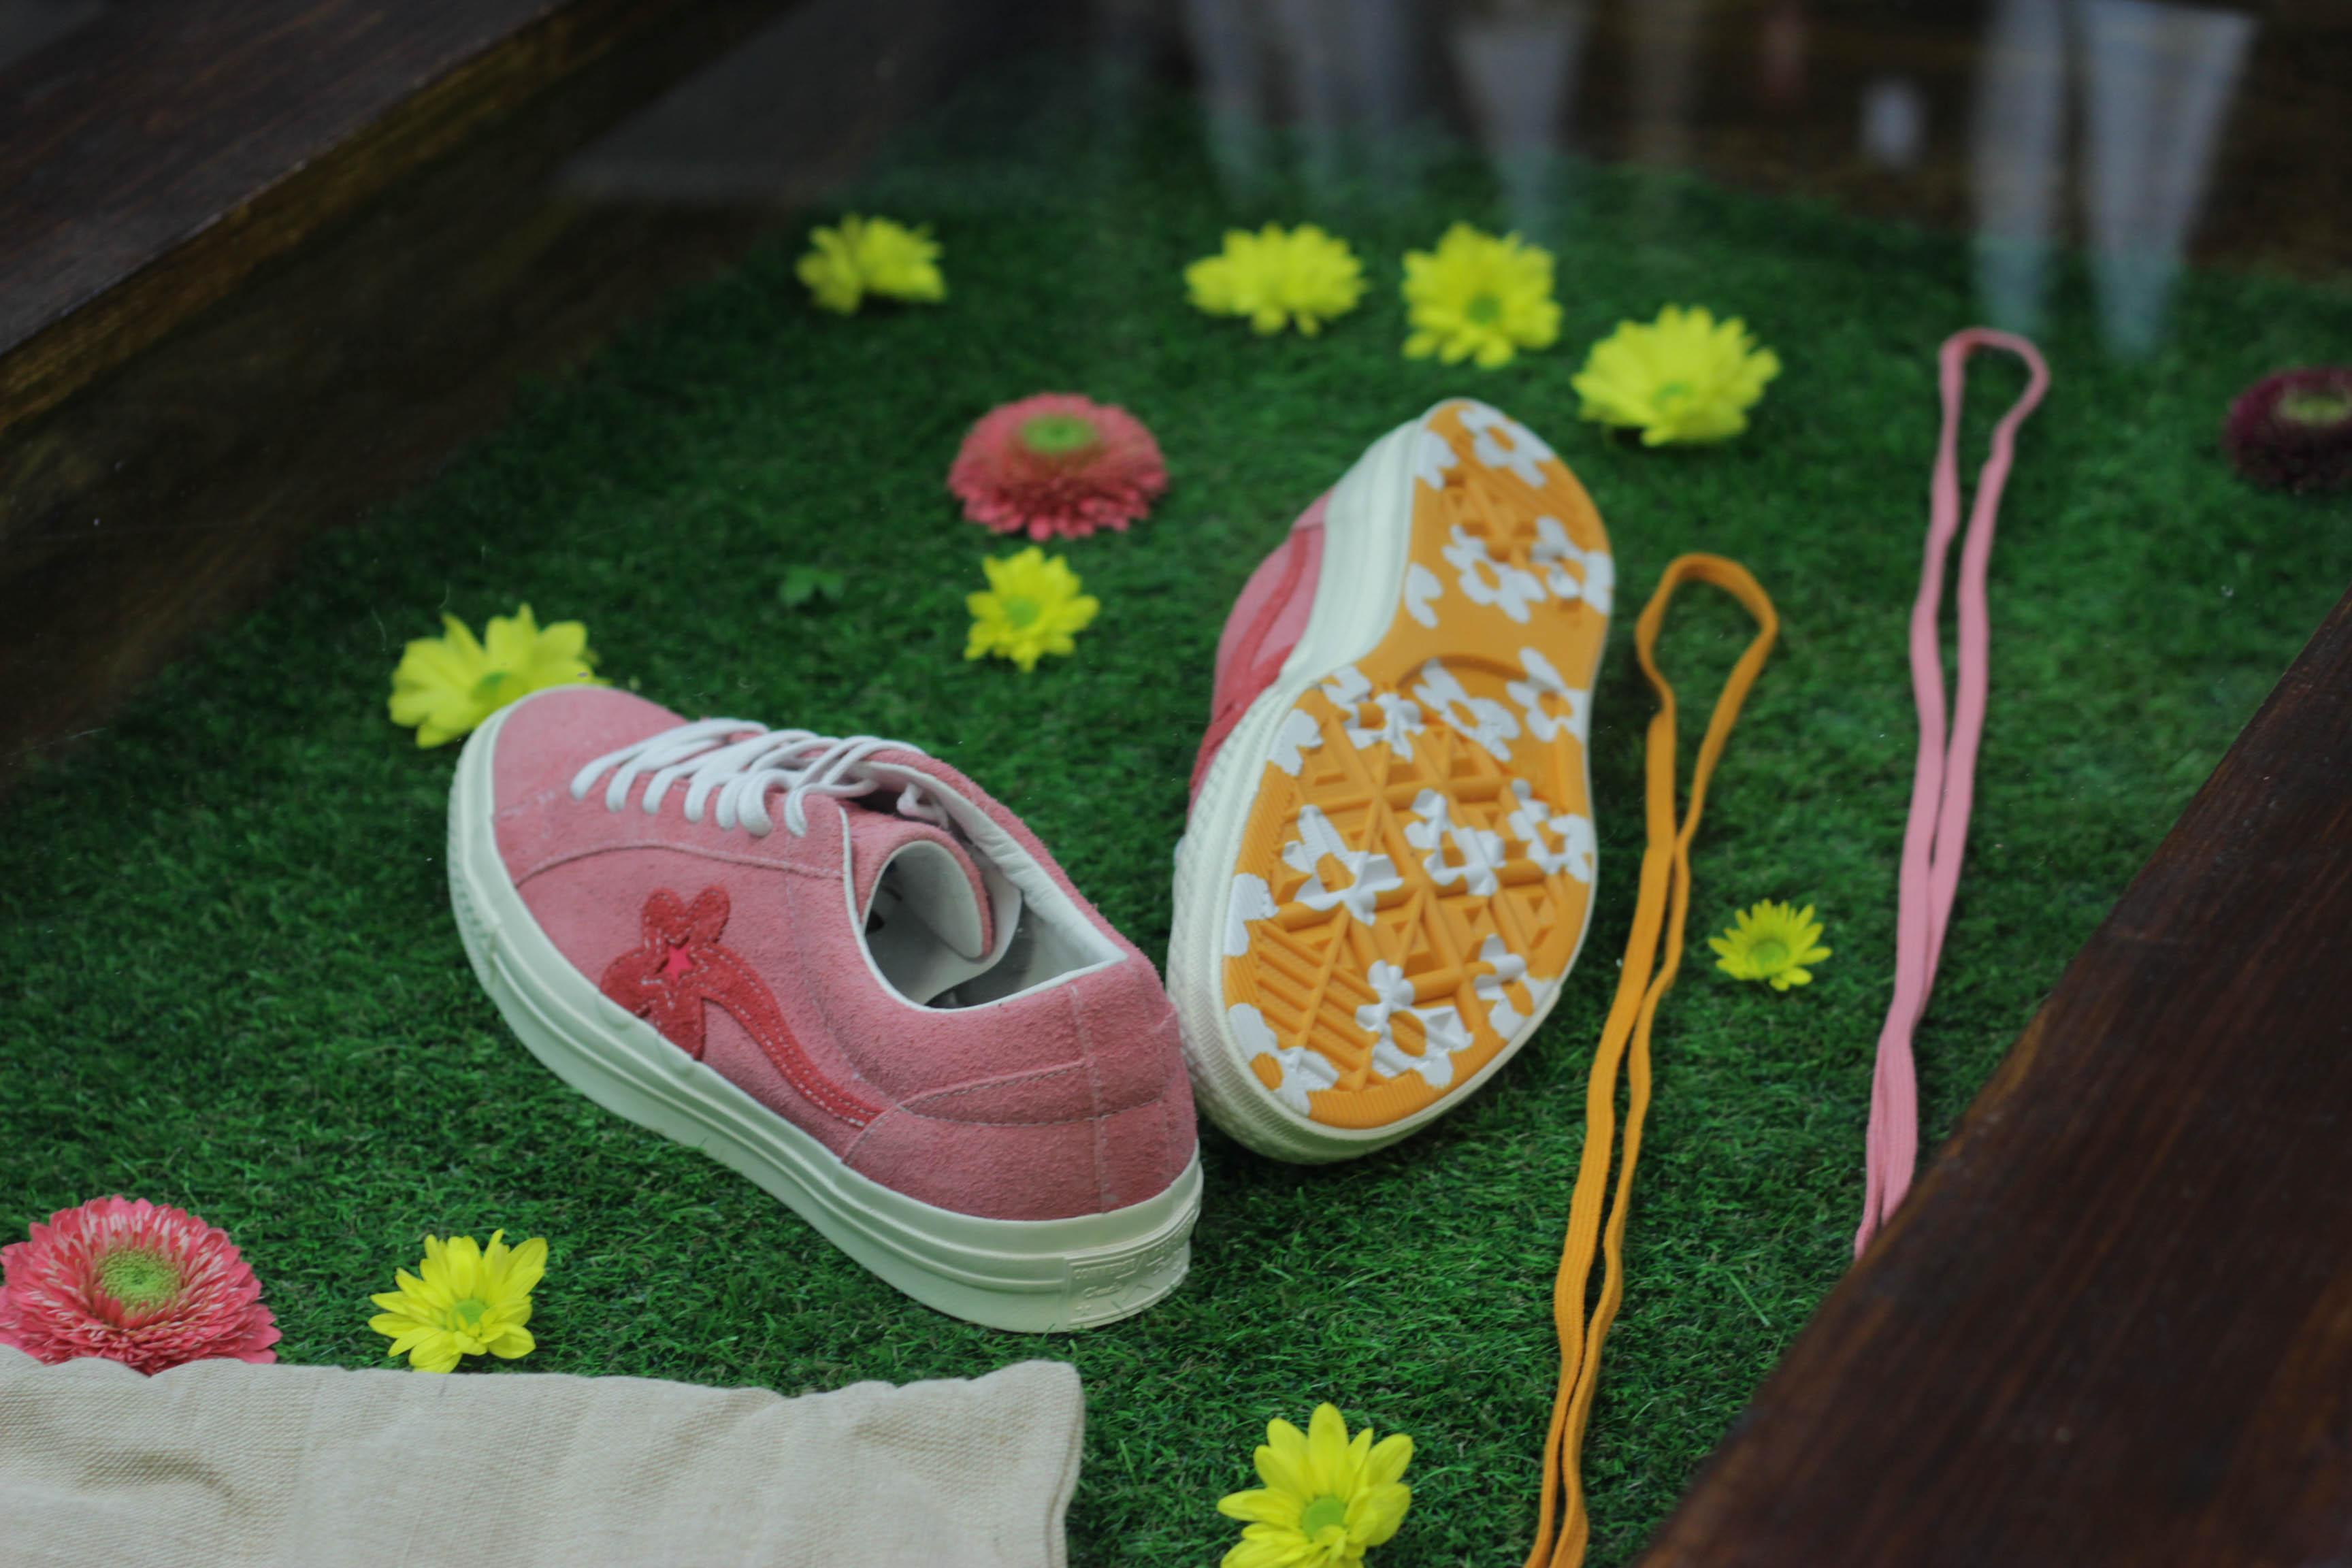 converse tyler the creator golf le fleur